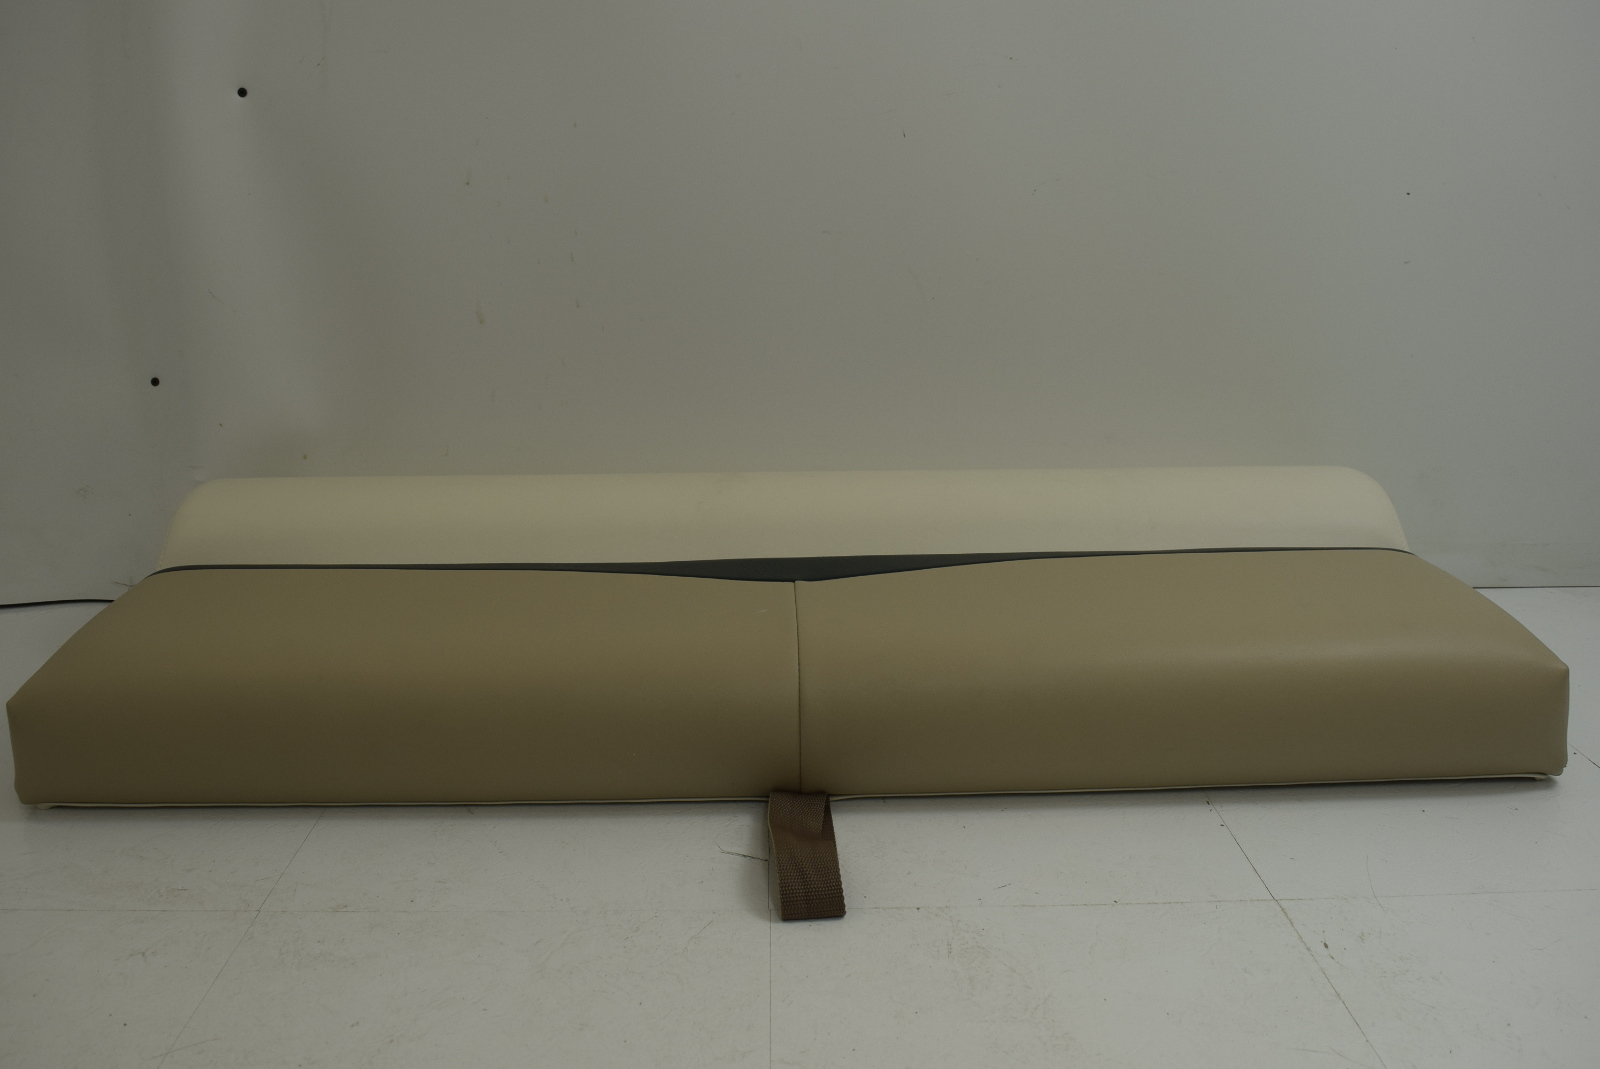 Pontoon Triton Boat Seat 250 LX 2001 Beige/Hunter Green/Cream